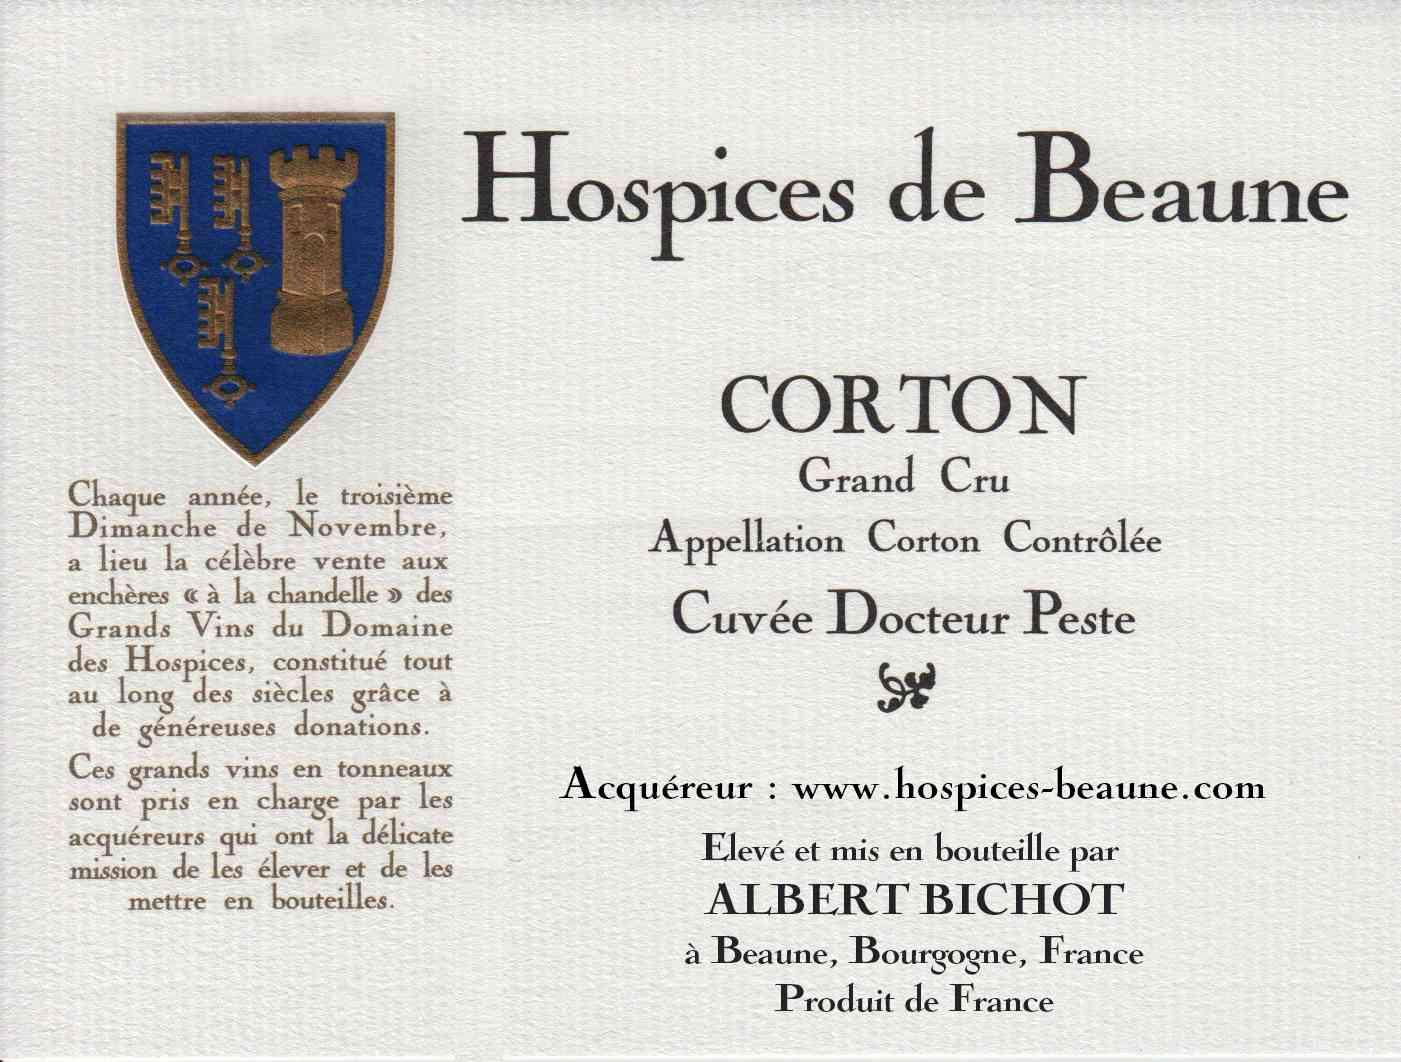 Encheres-auction-HospicesdeBeaune-AlbertBichot-CortonGrandCru-Cuvee-DocteurPeste